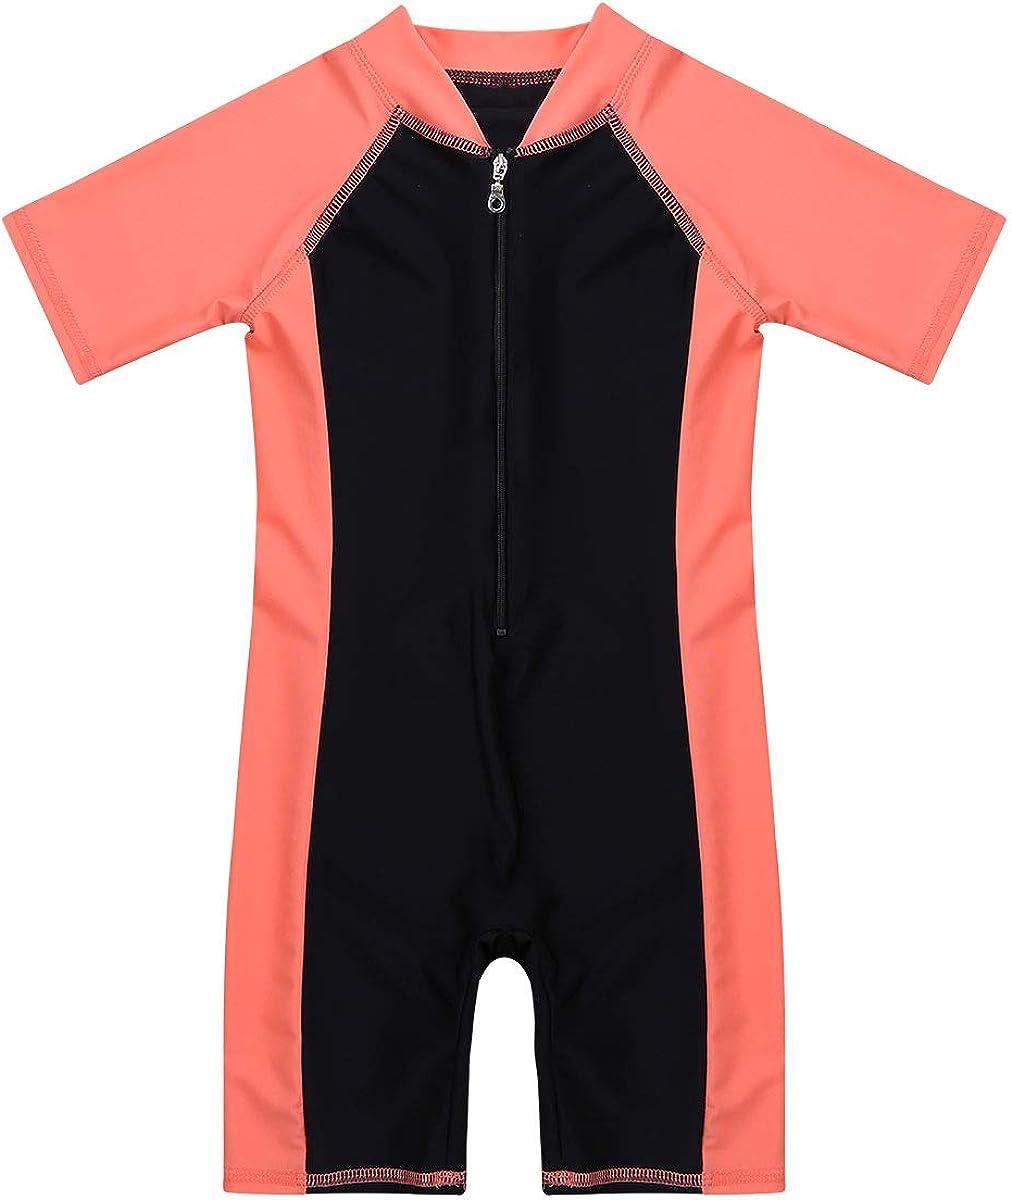 TTAO Kids Boys//Girls One Piece Short Sleeves Zippered Rash Guard Shorty Wetsuit Swimsuit Bathing Suit UPF 50+